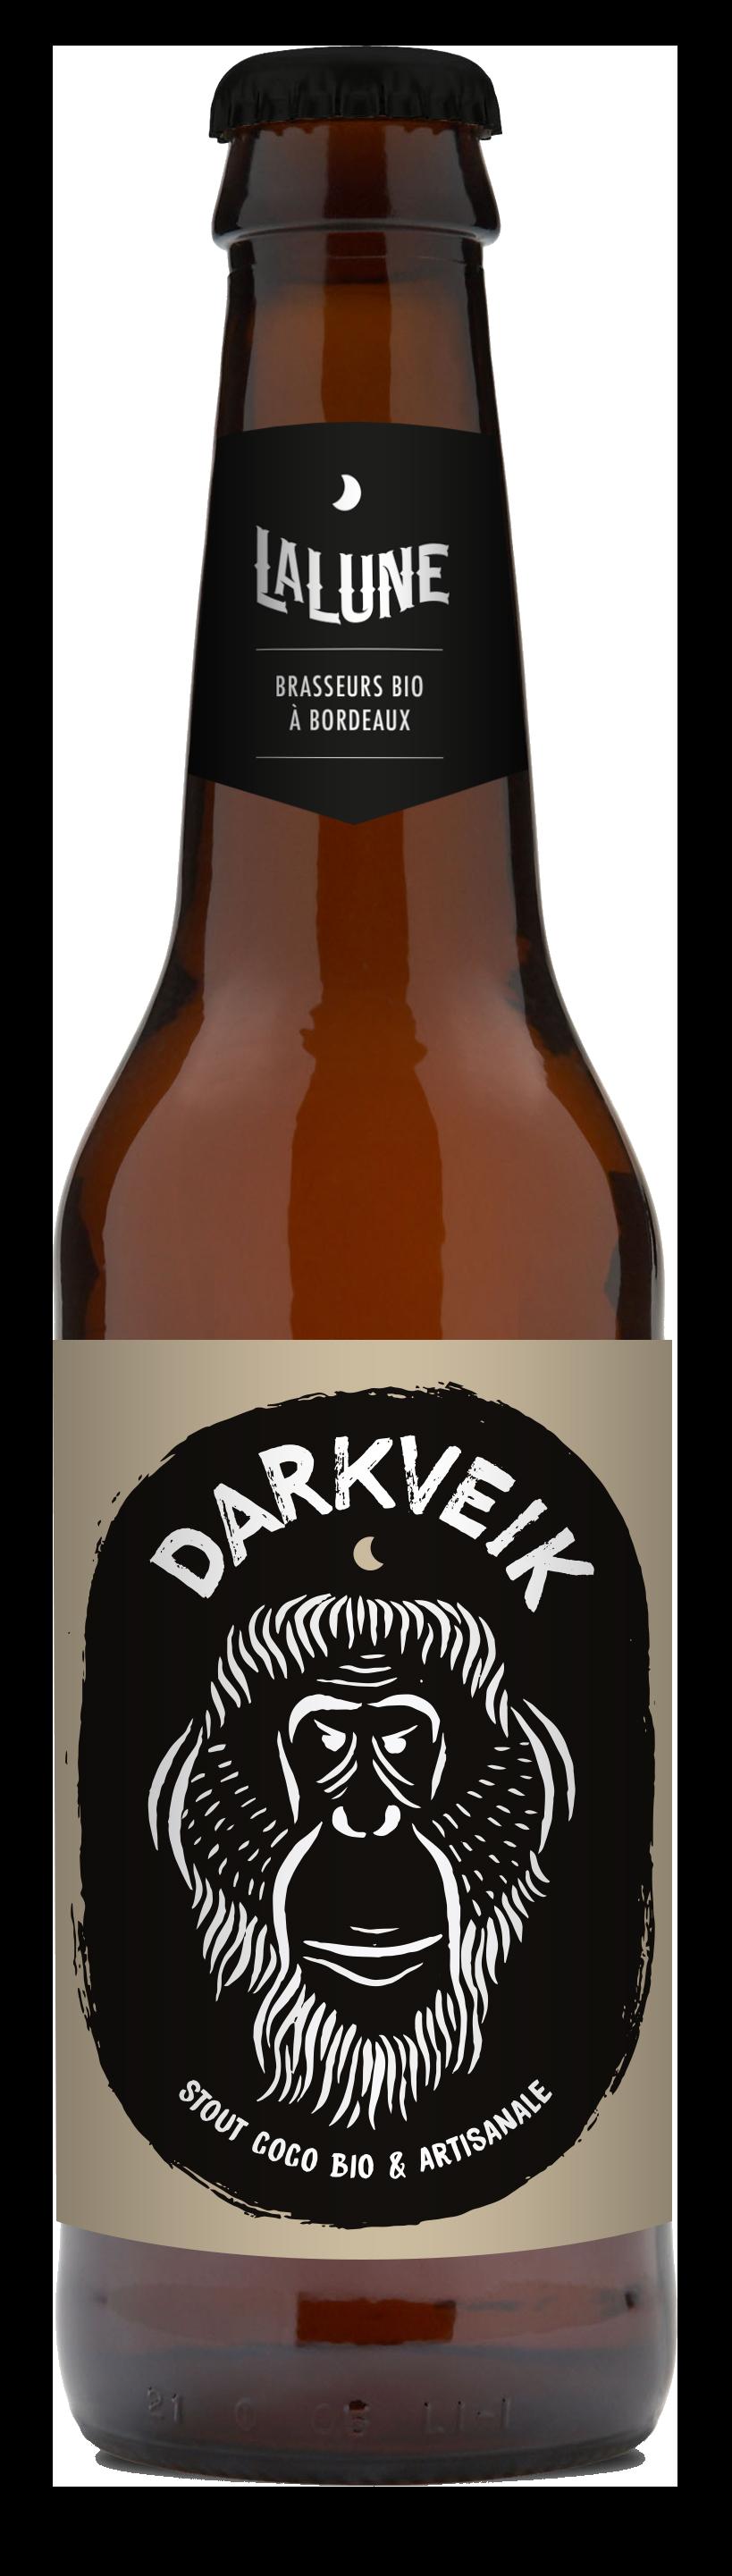 bouteille-bière-Darkveik-stout-coco